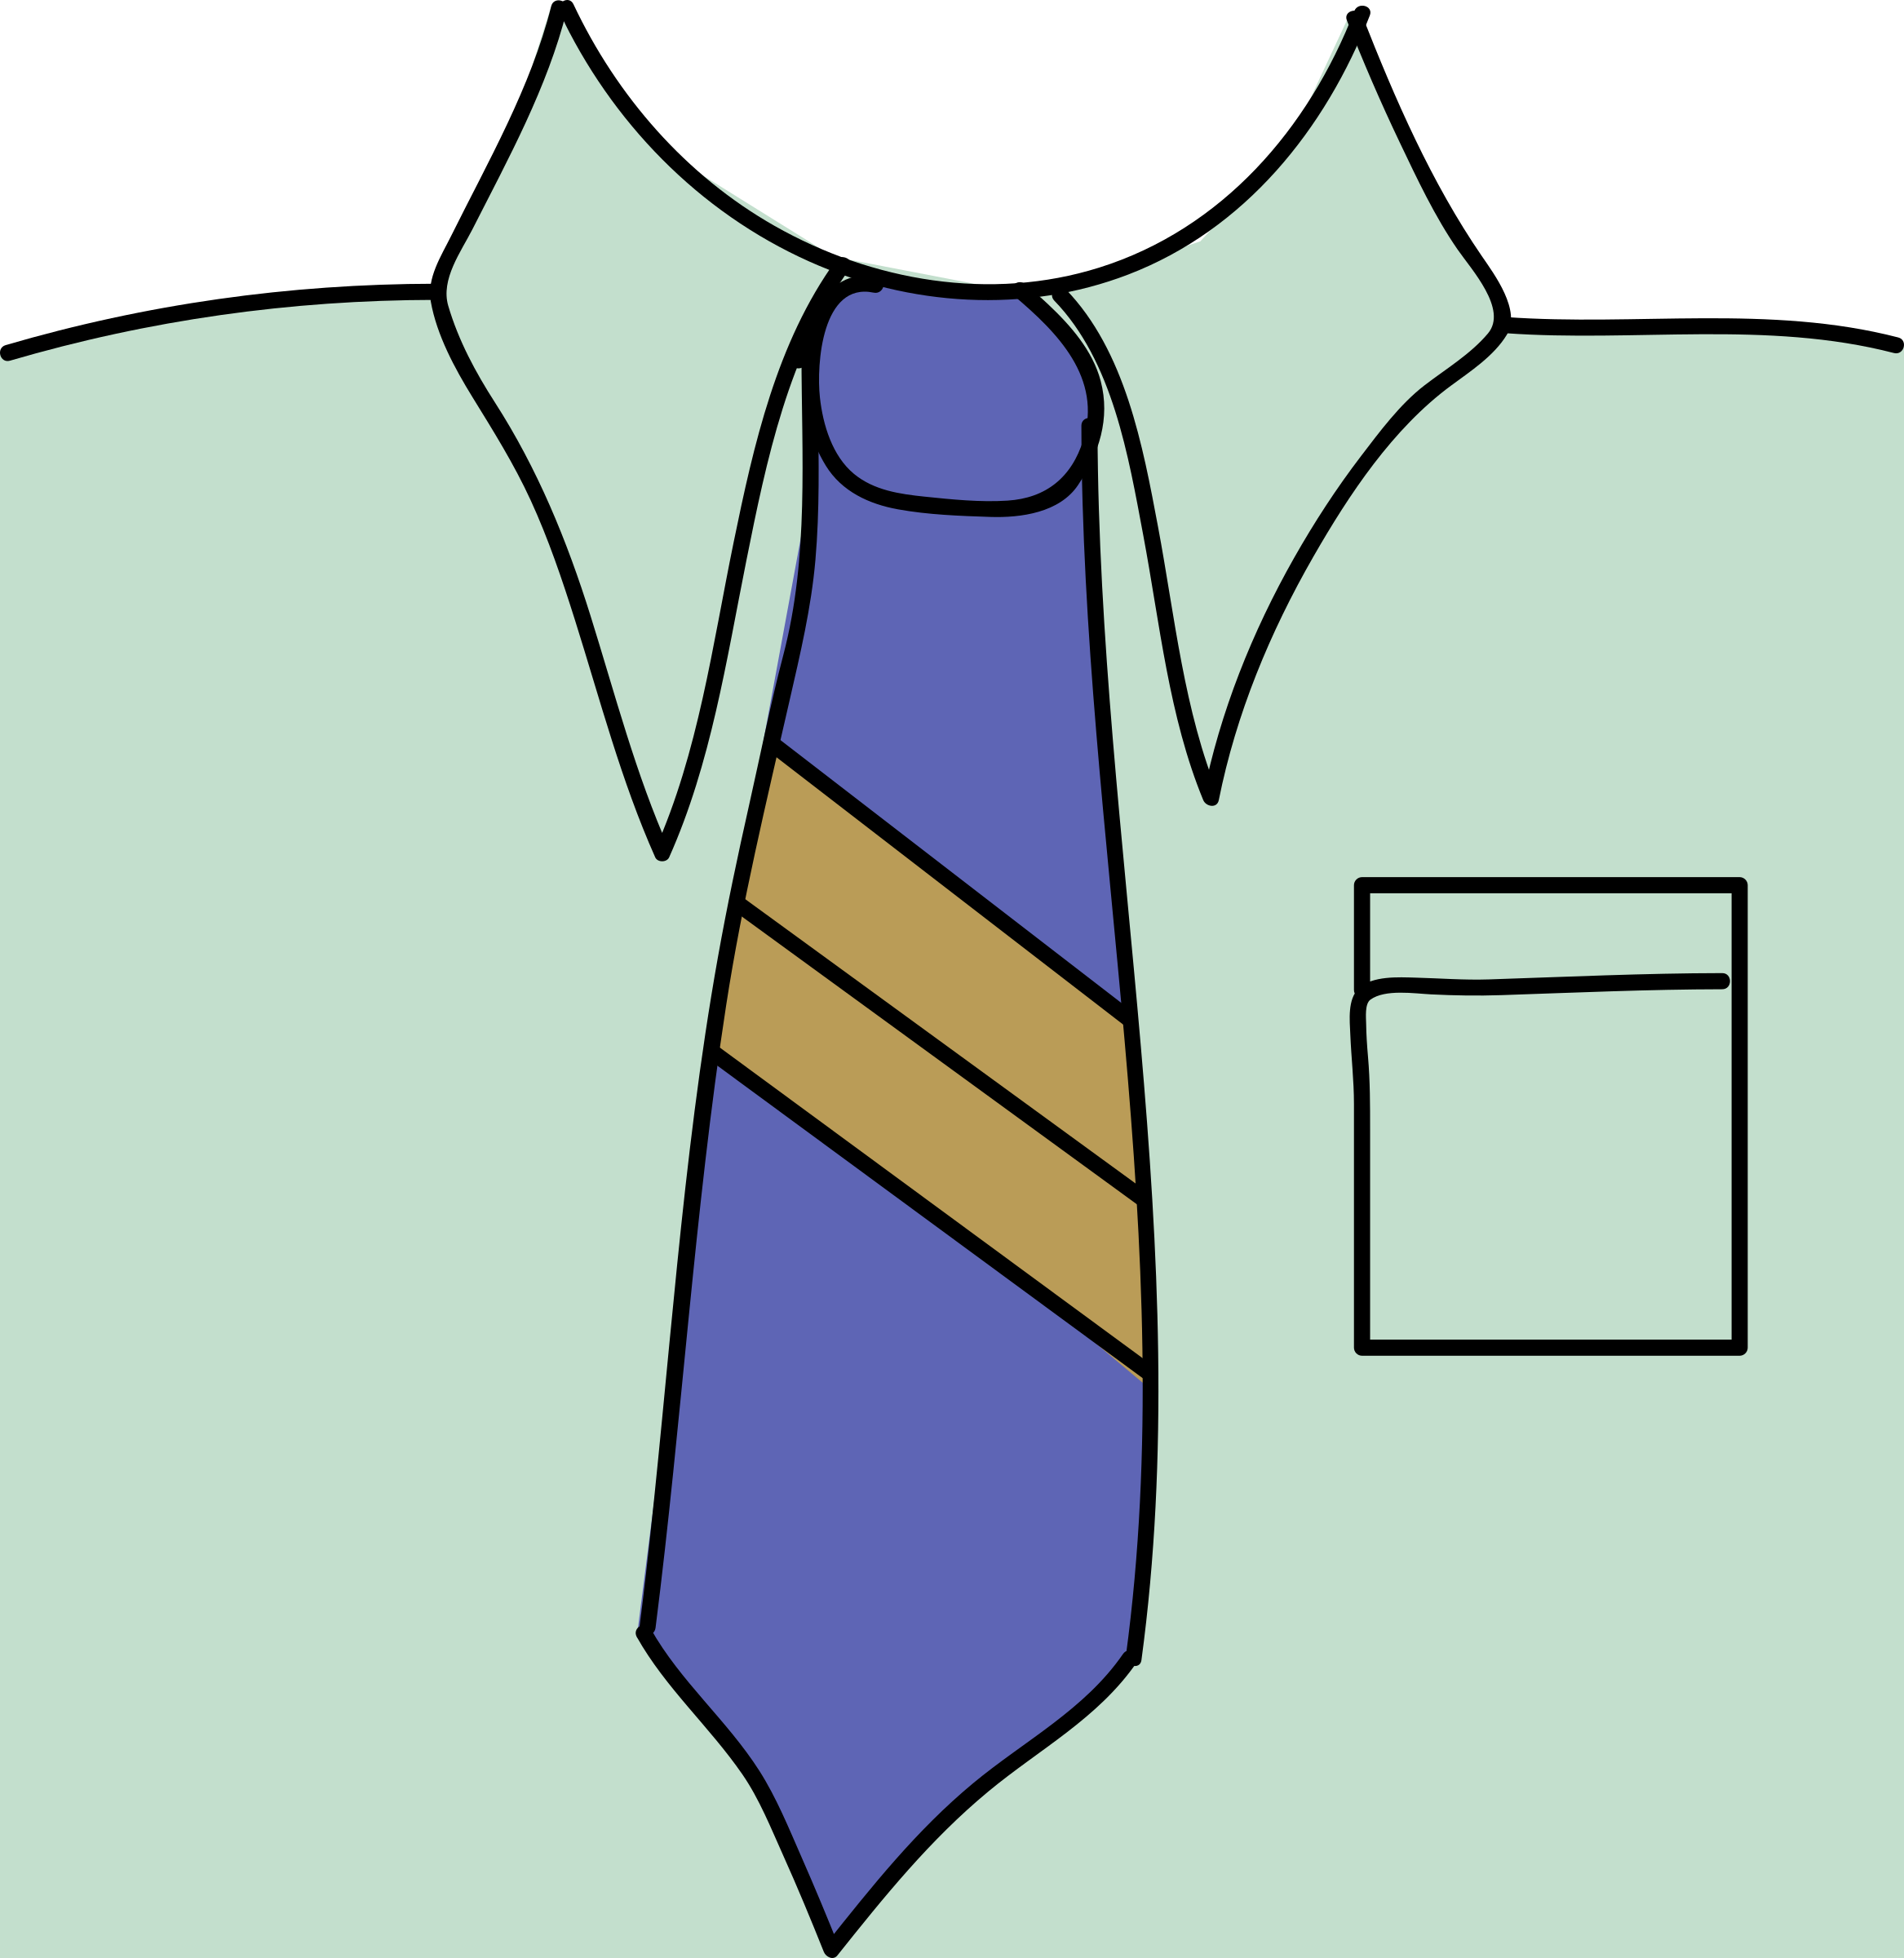 Tie clipart collar Clipart Blue Tie Blue Tie